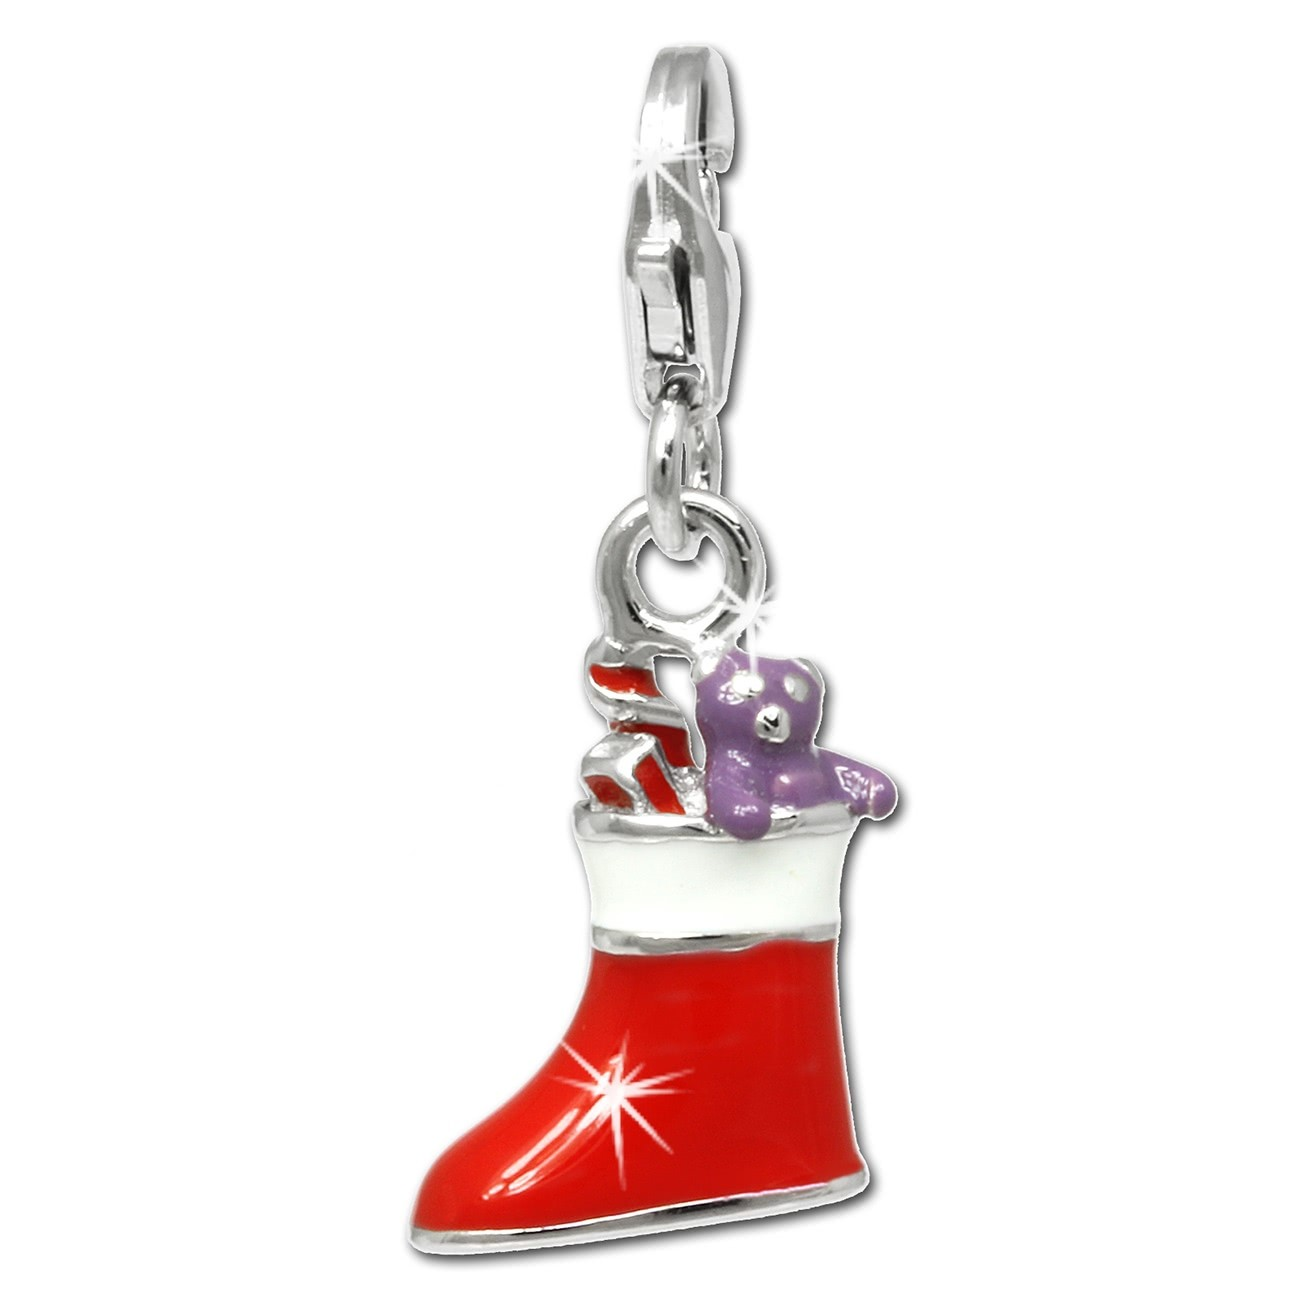 SilberDream Charm Weihnachtsstiefel 925 Silber Armband Anhänger FC810R